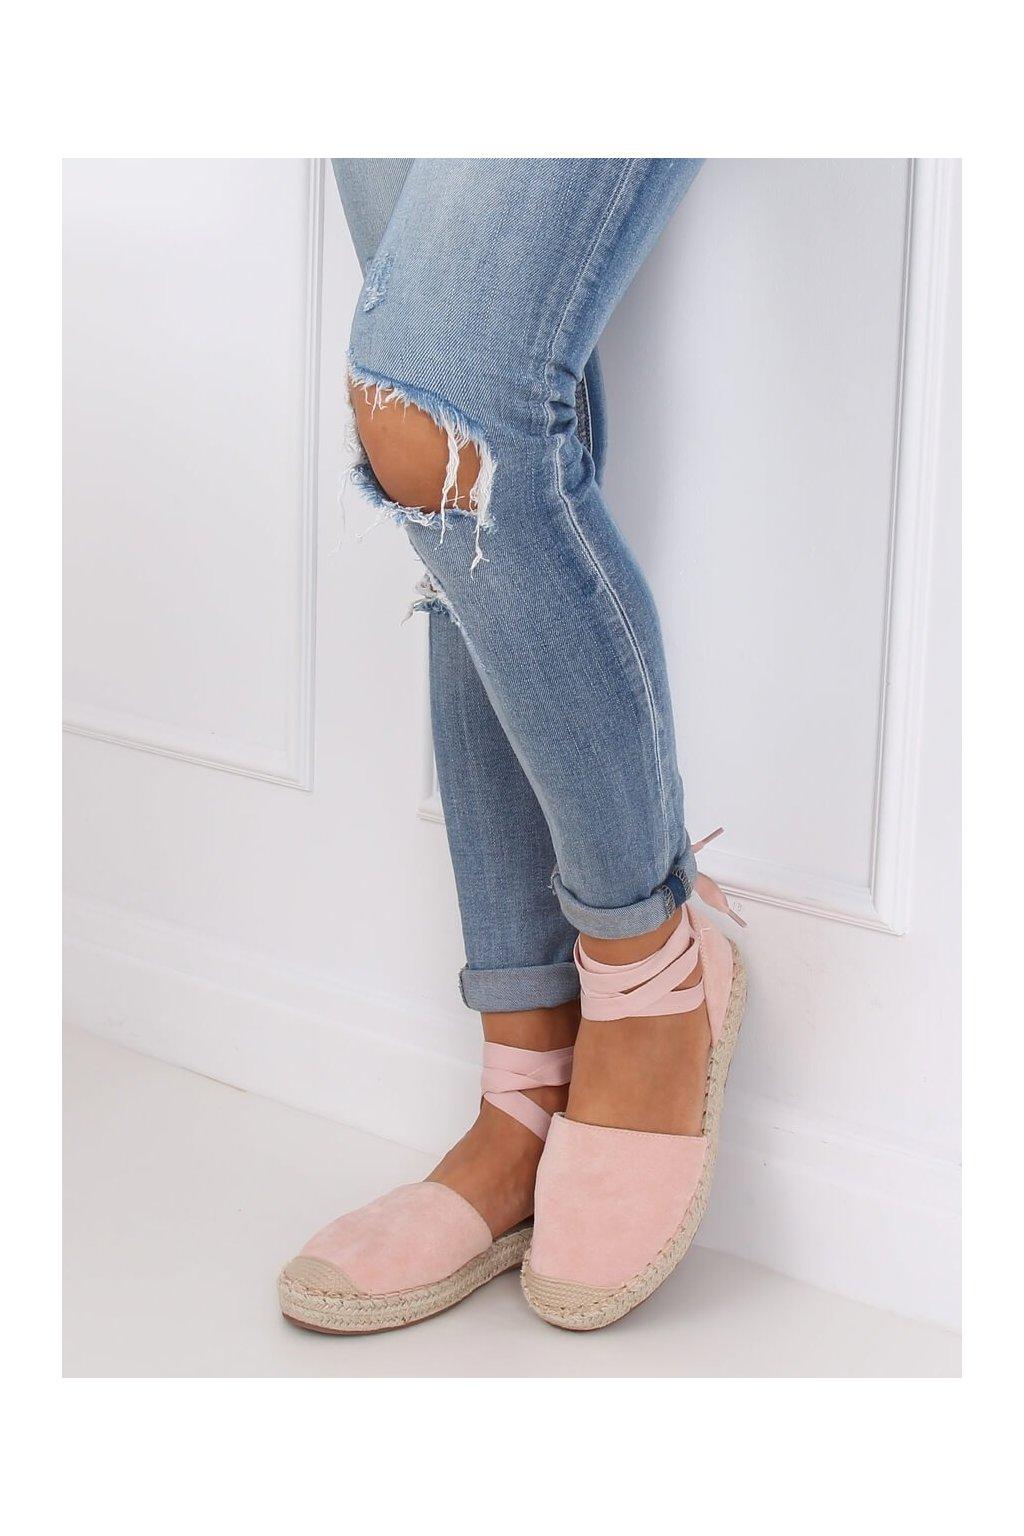 Dámske sandále ružové NJSK LL-230P